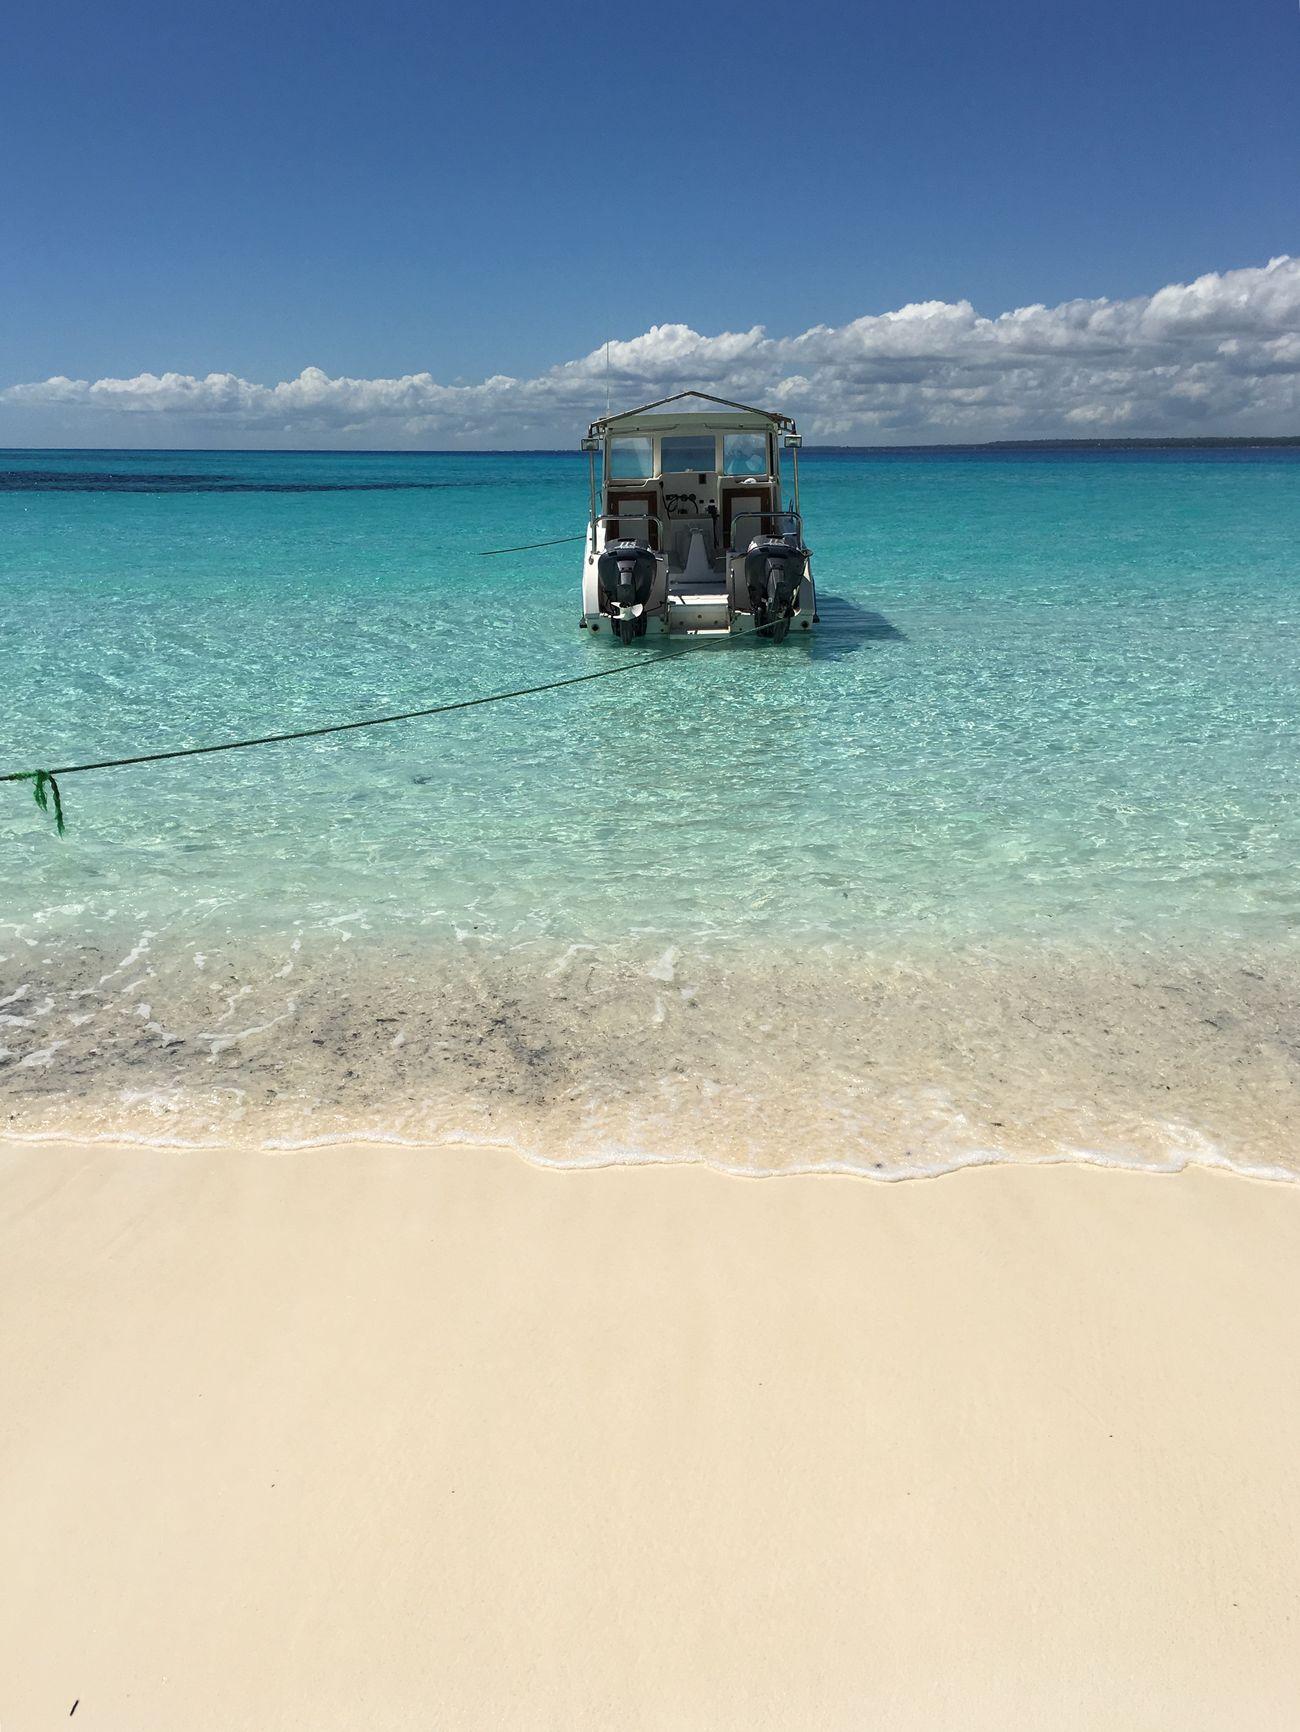 Boat Mnemba Island Indian Ocean Zanzibar Tanzania